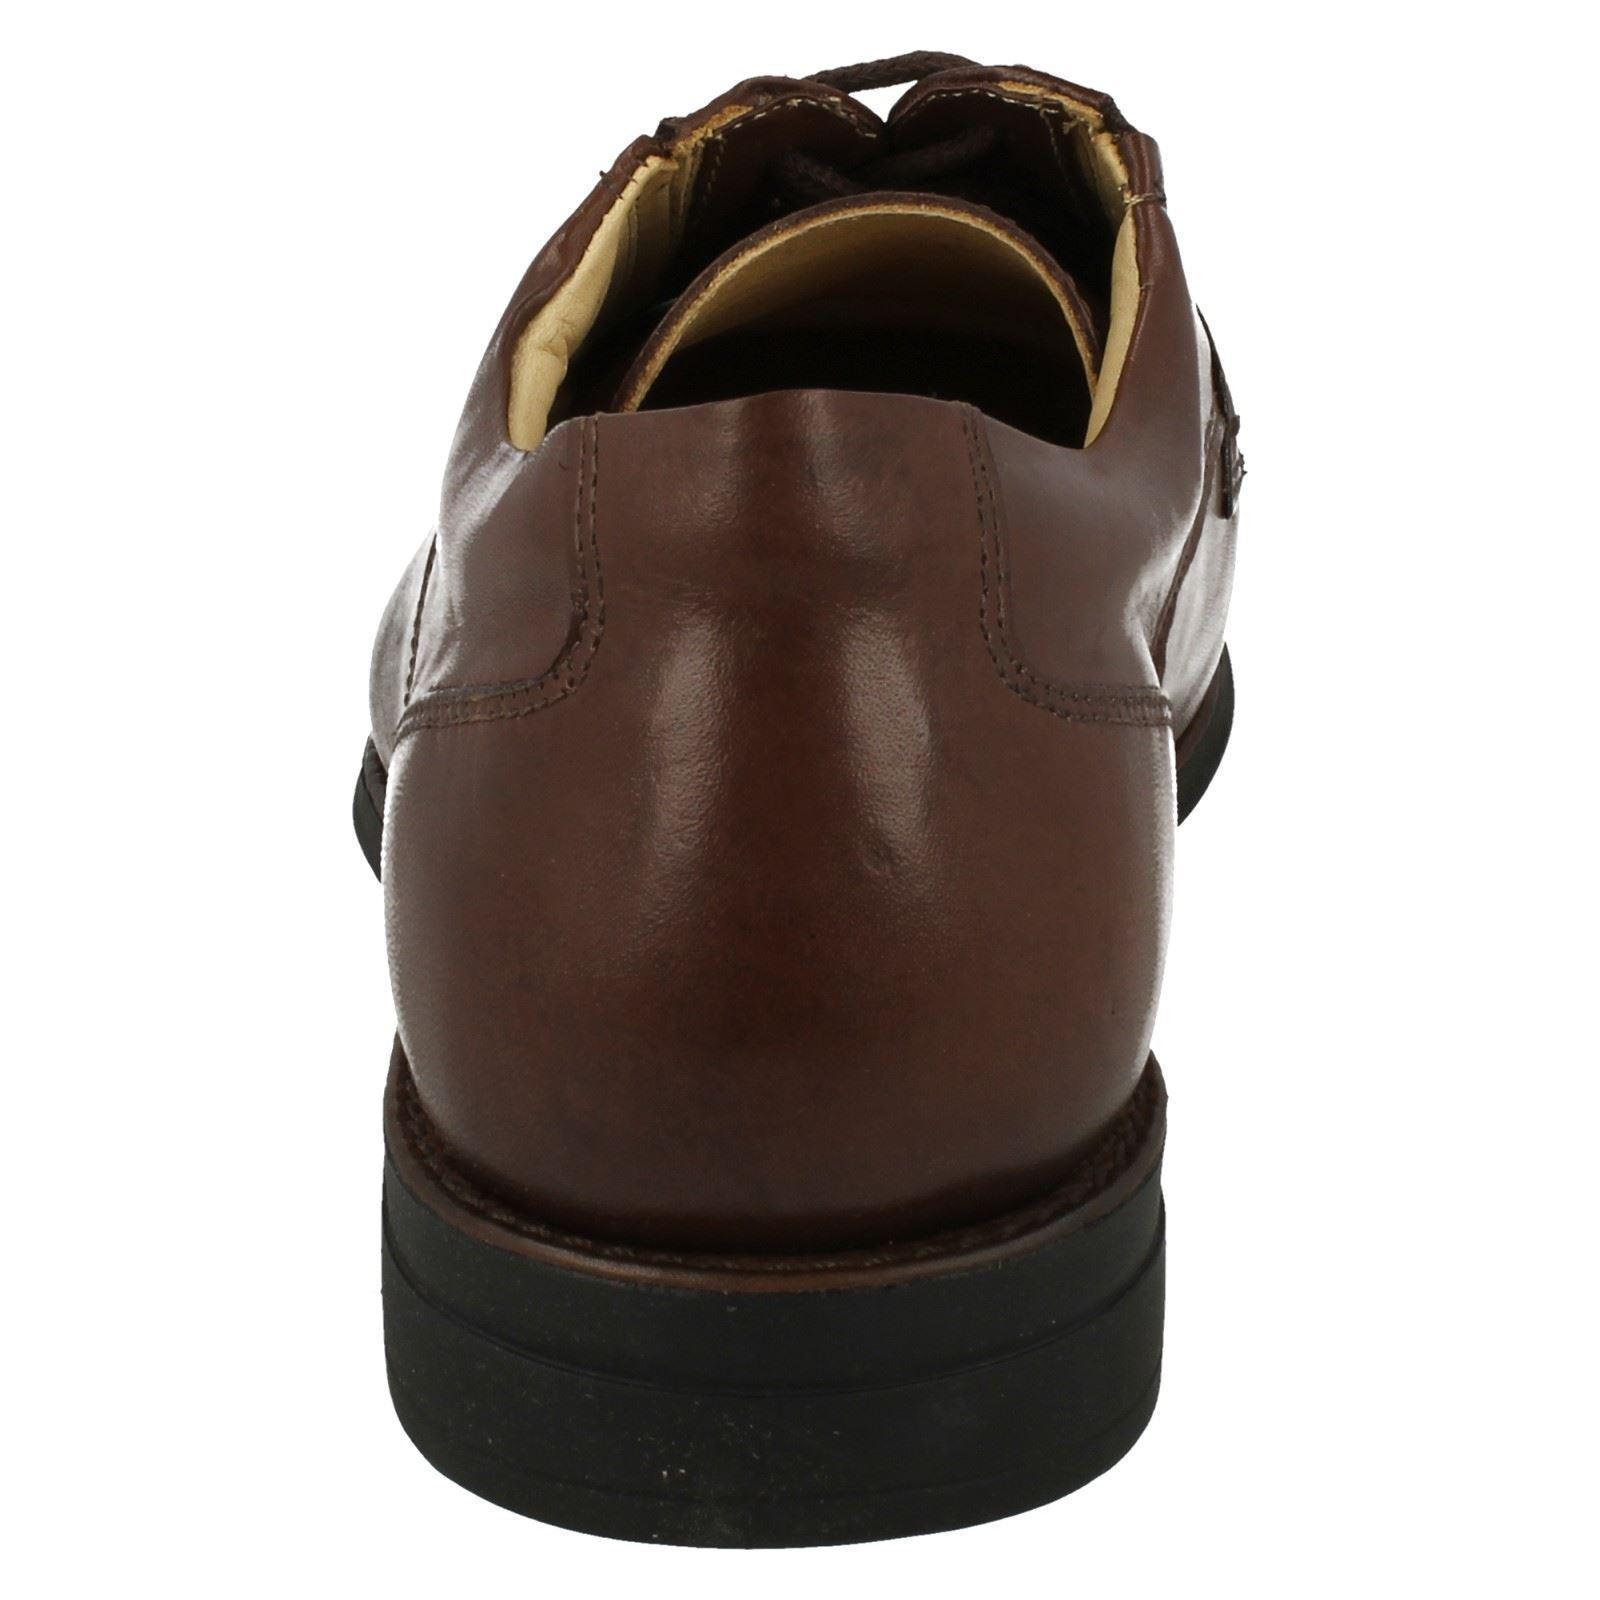 Sale Herren Anatomic Gel Leather Leather Leather Schnürschuh Platina    c2763c